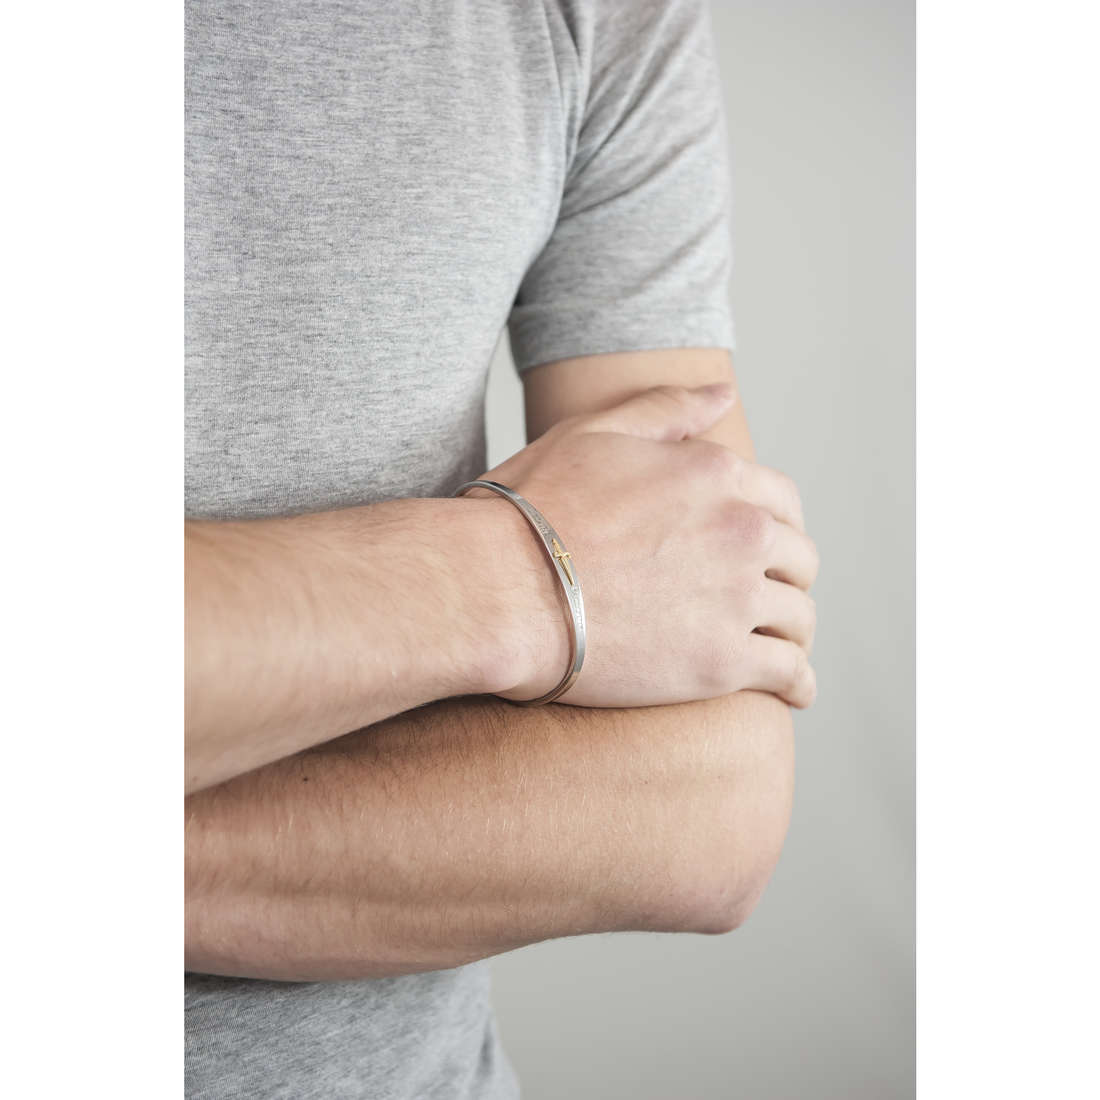 Cesare Paciotti bracciali uomo JPBR1263B indosso